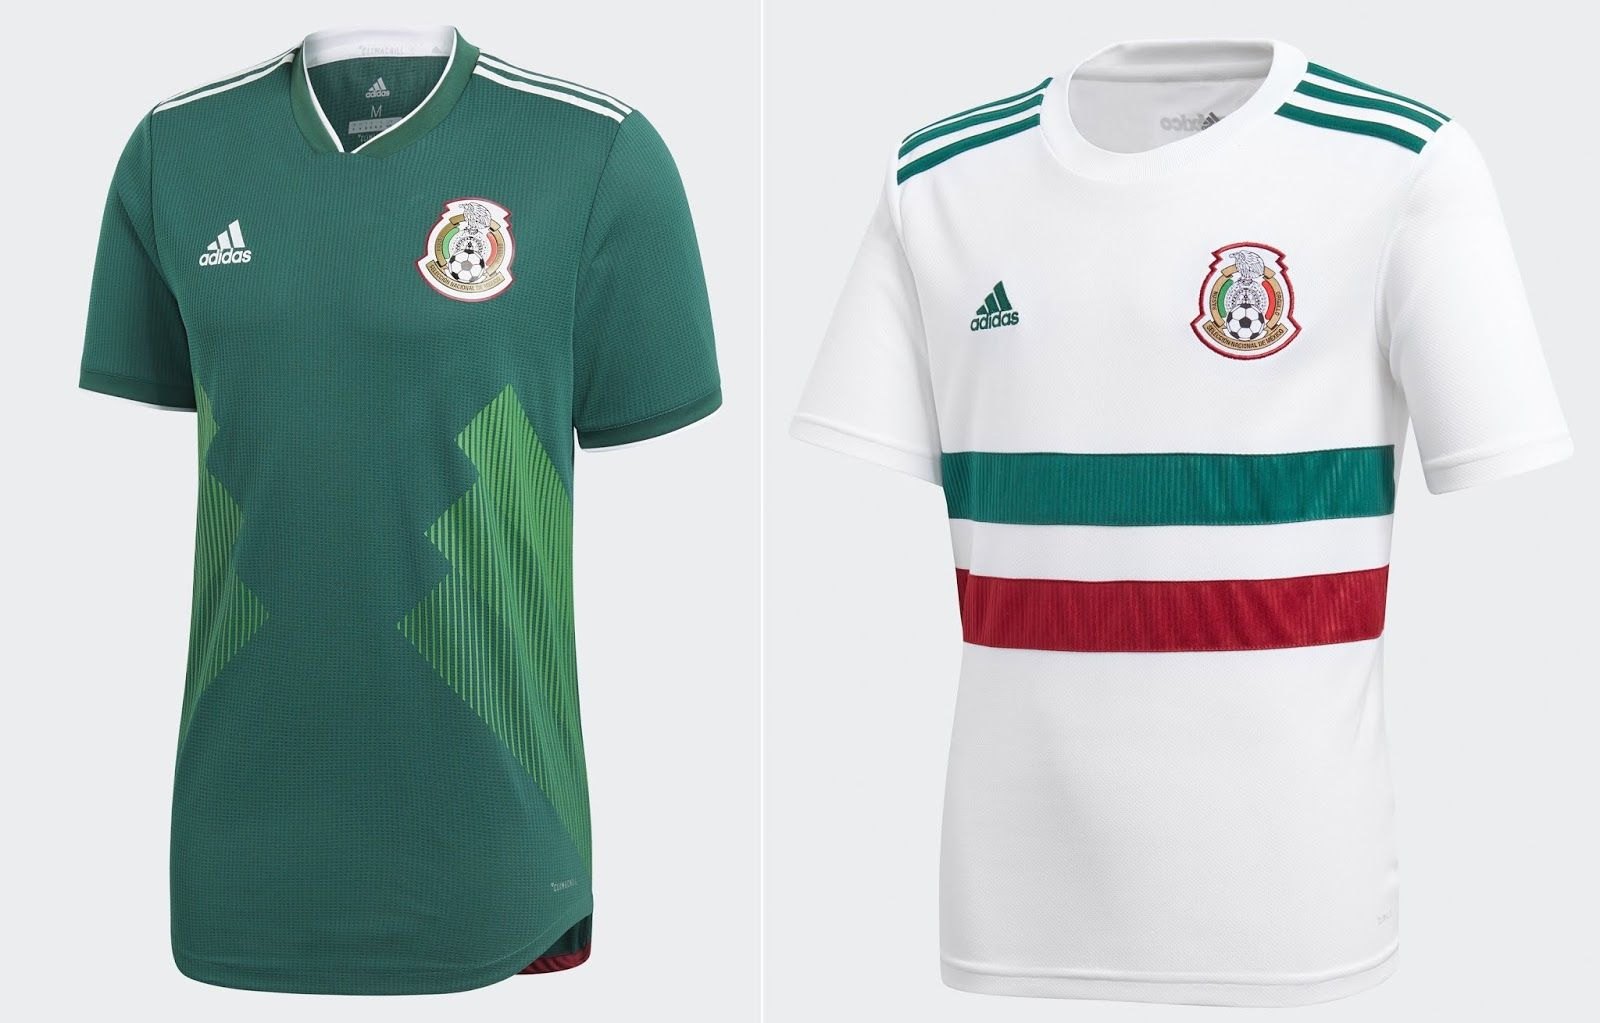 ed316d369f5e0 World Cup 2018 Kits Portugal (Home   Away Jerseys) – Nike  disnaija ...